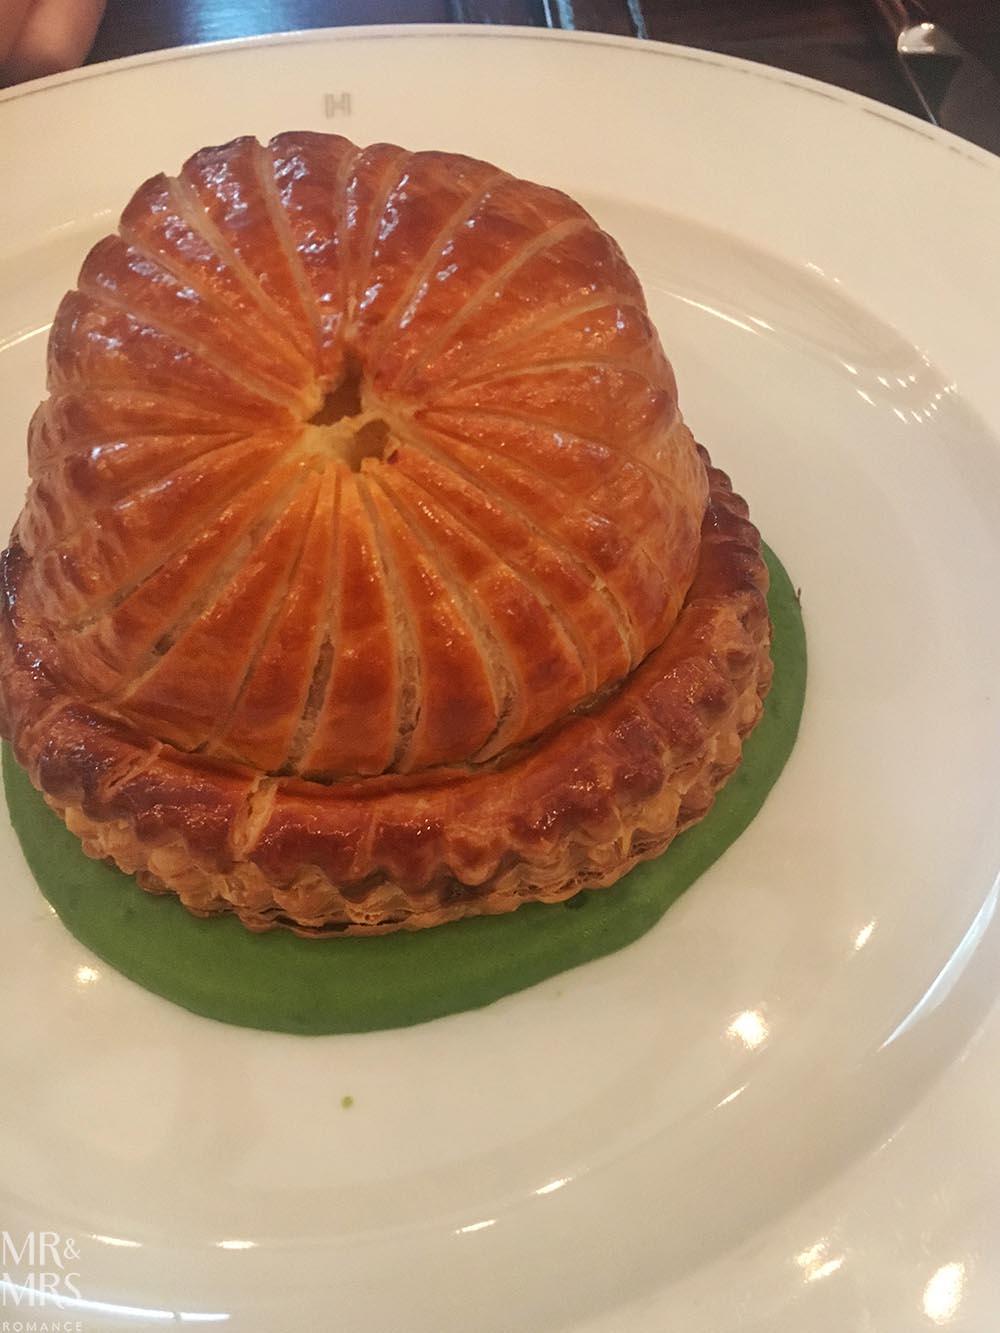 Potato Comte pie at Holborn Dining Room London